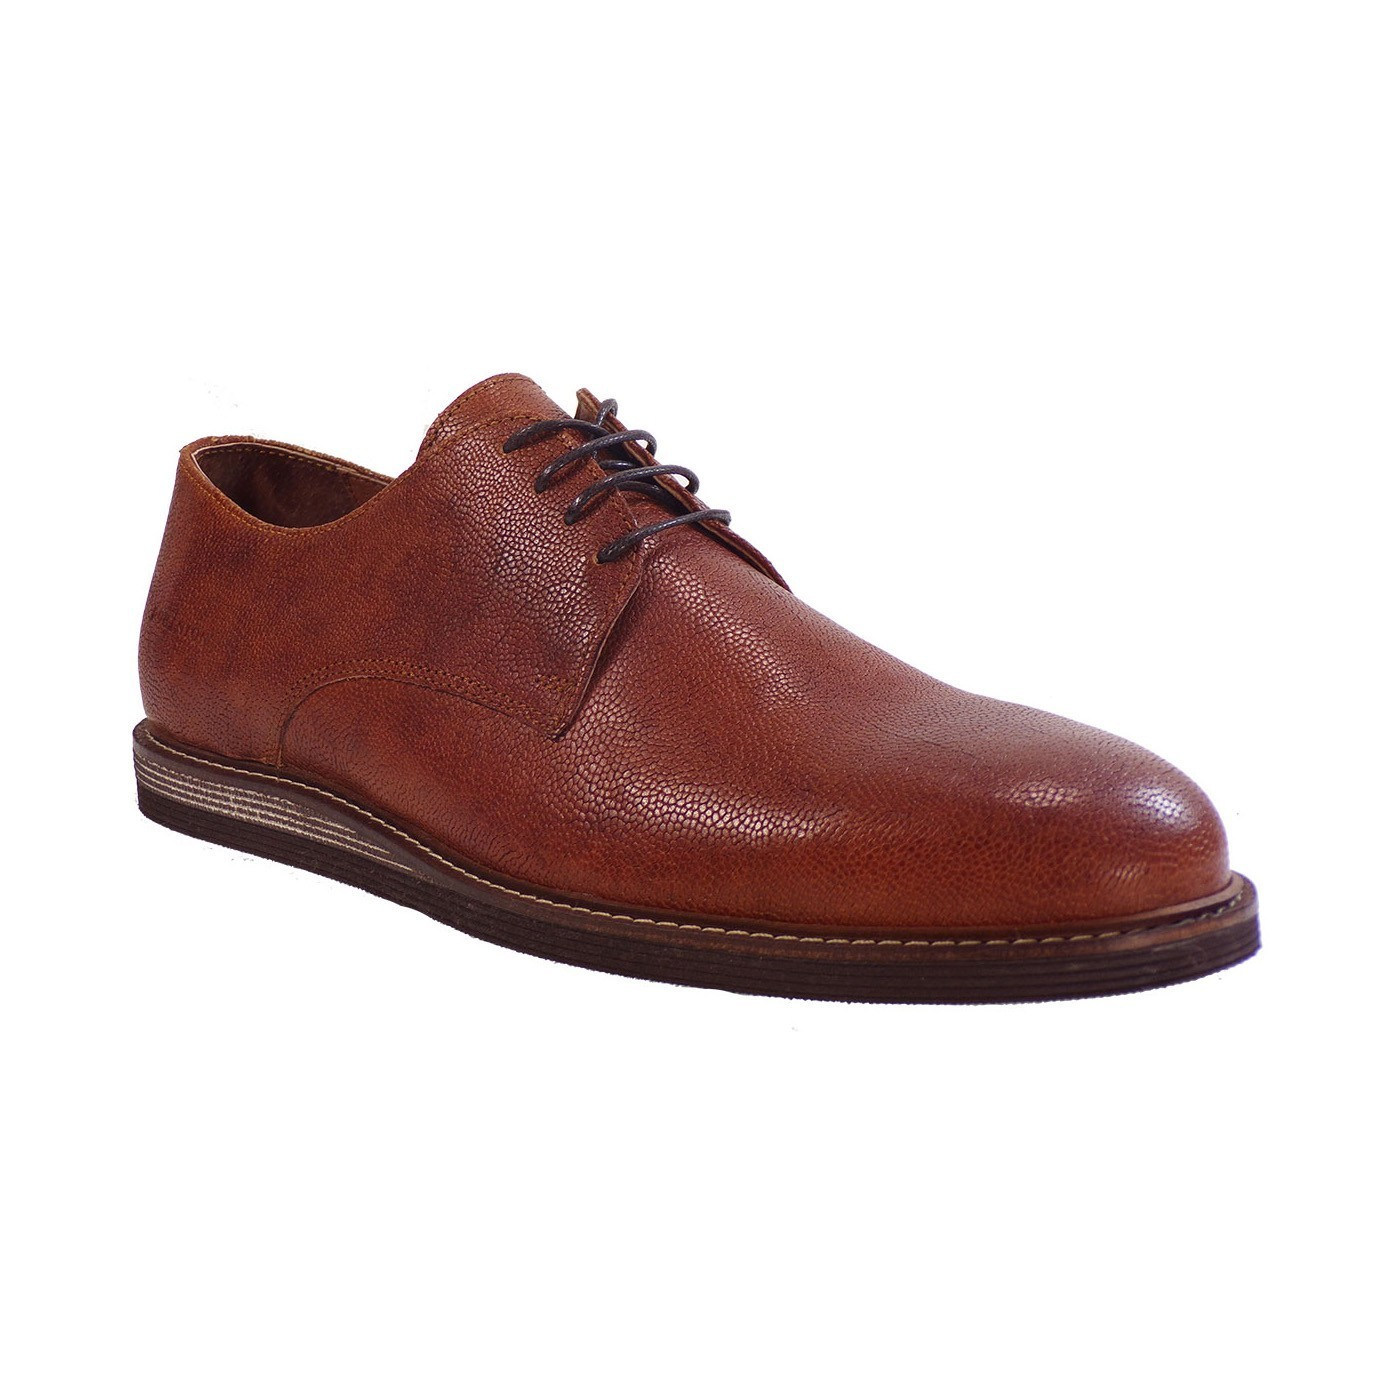 Robinson Ανδρικά Παπούτσια 2115 Ταμπά